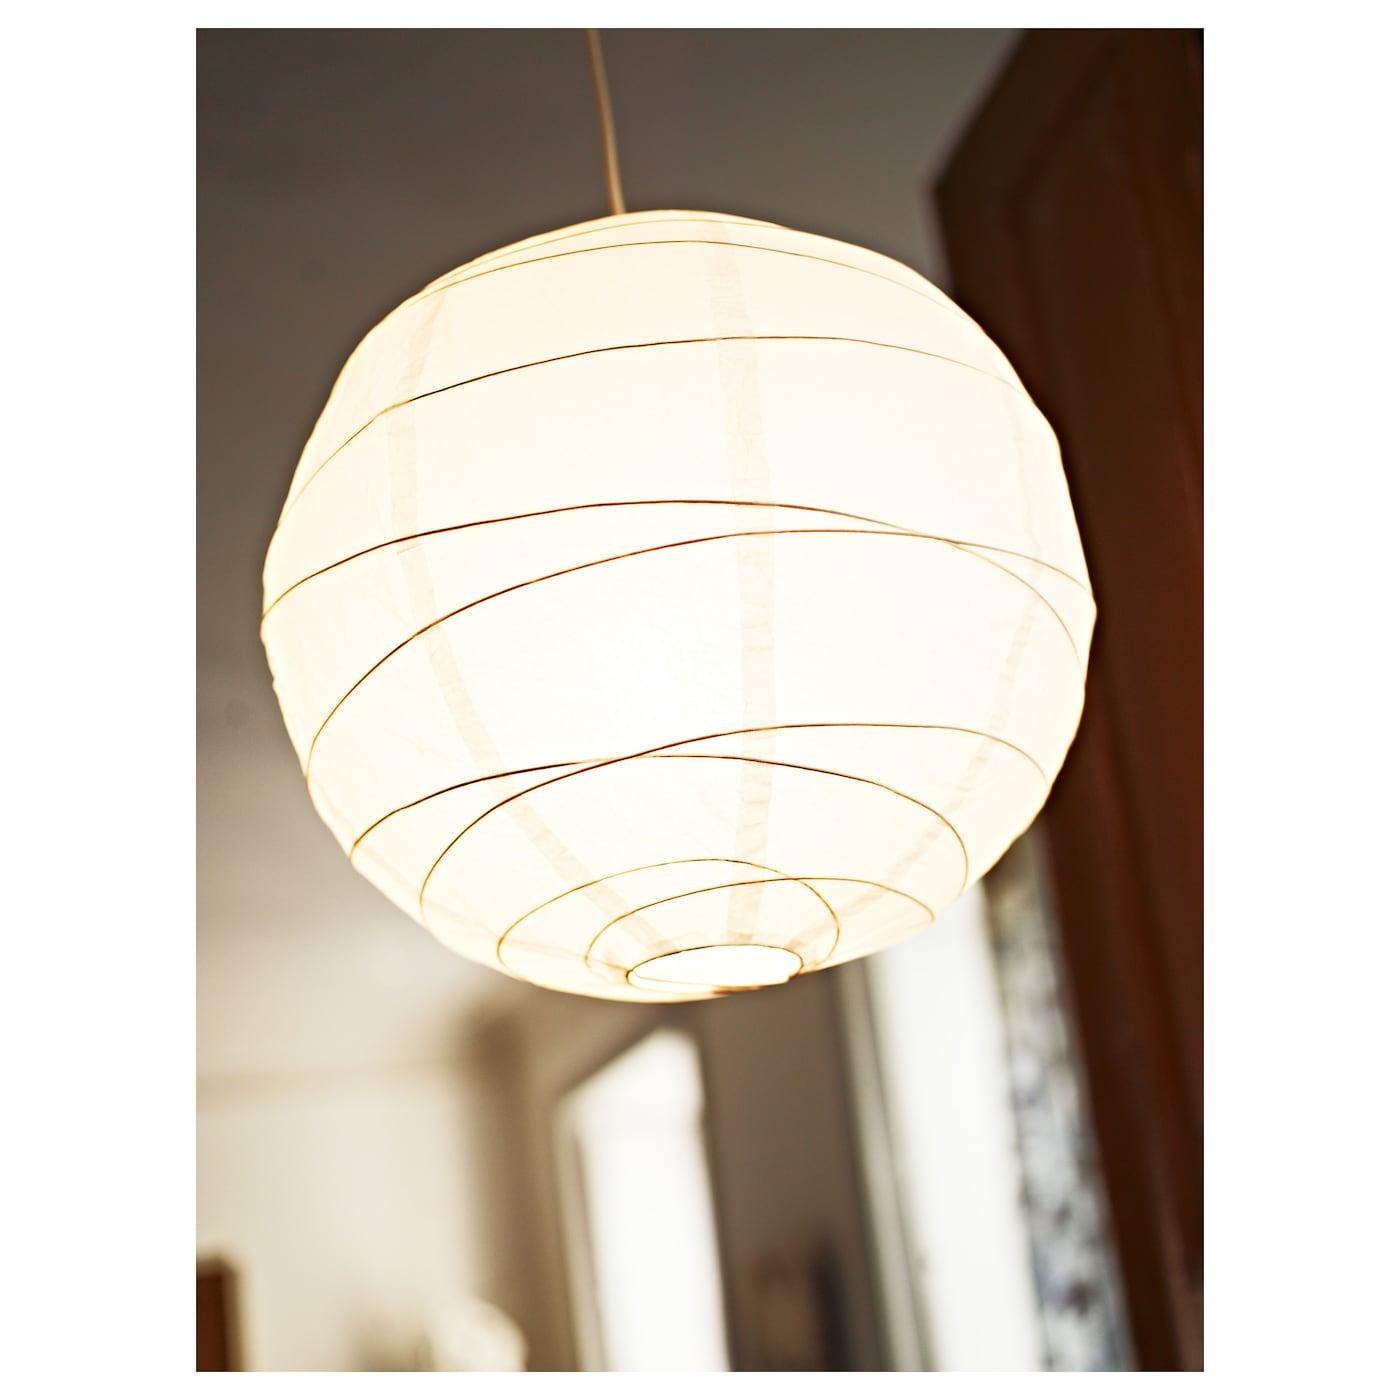 Regolit Pendant Lamp Shade White 17 ¾